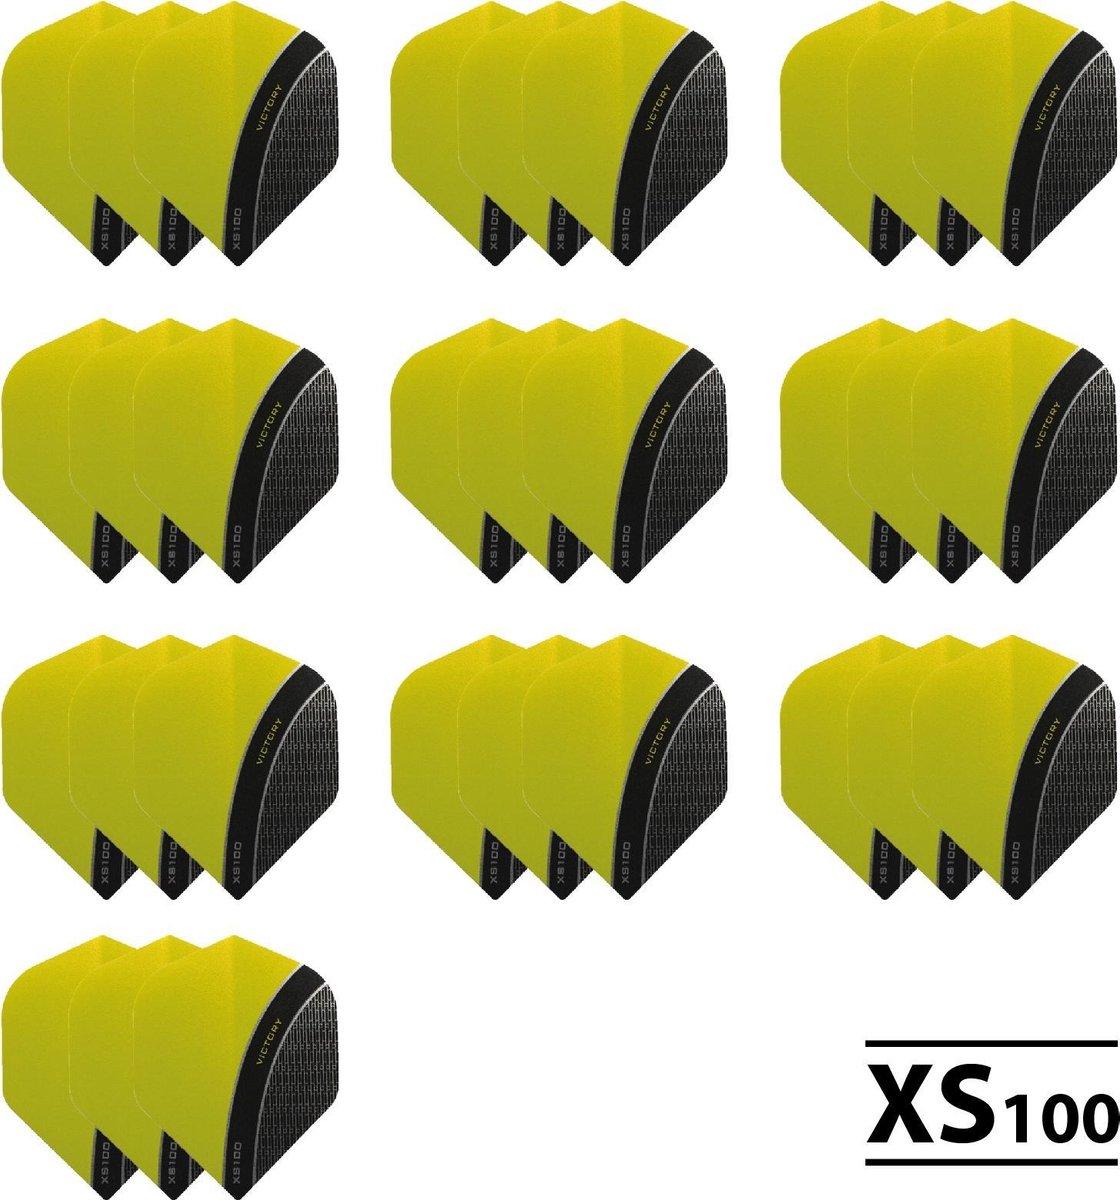 10 - Sets XS100 Curve 100 micron flights - Geel